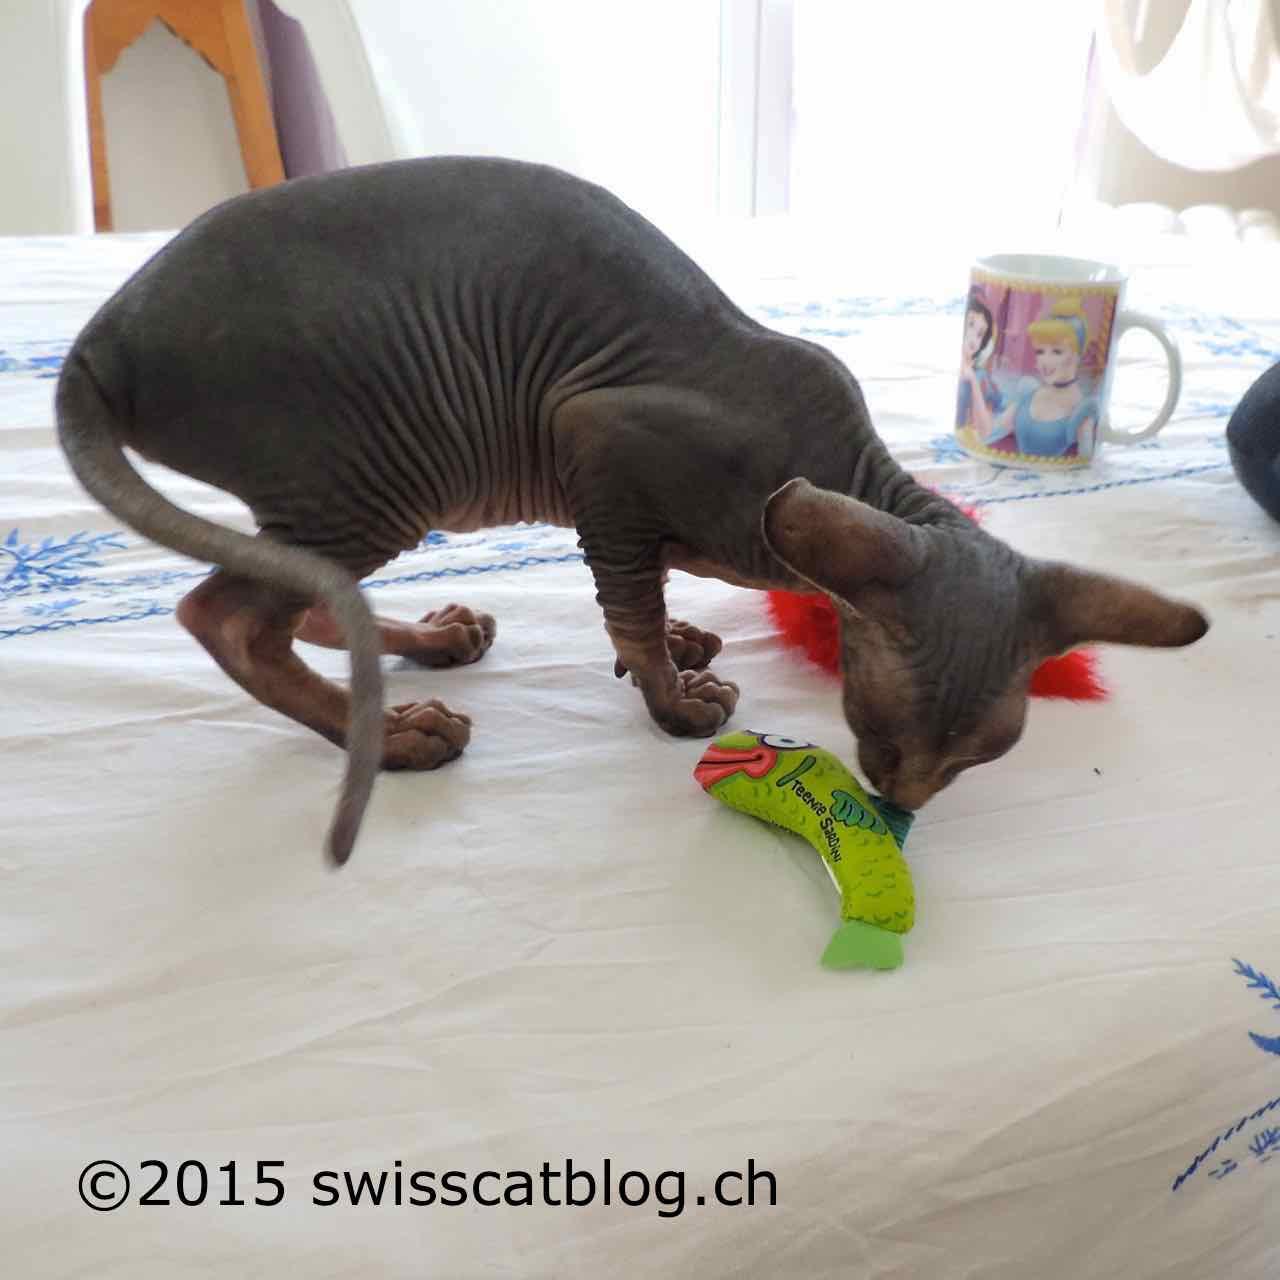 Bain de chats the swiss cats for Jardin bonheur 2015